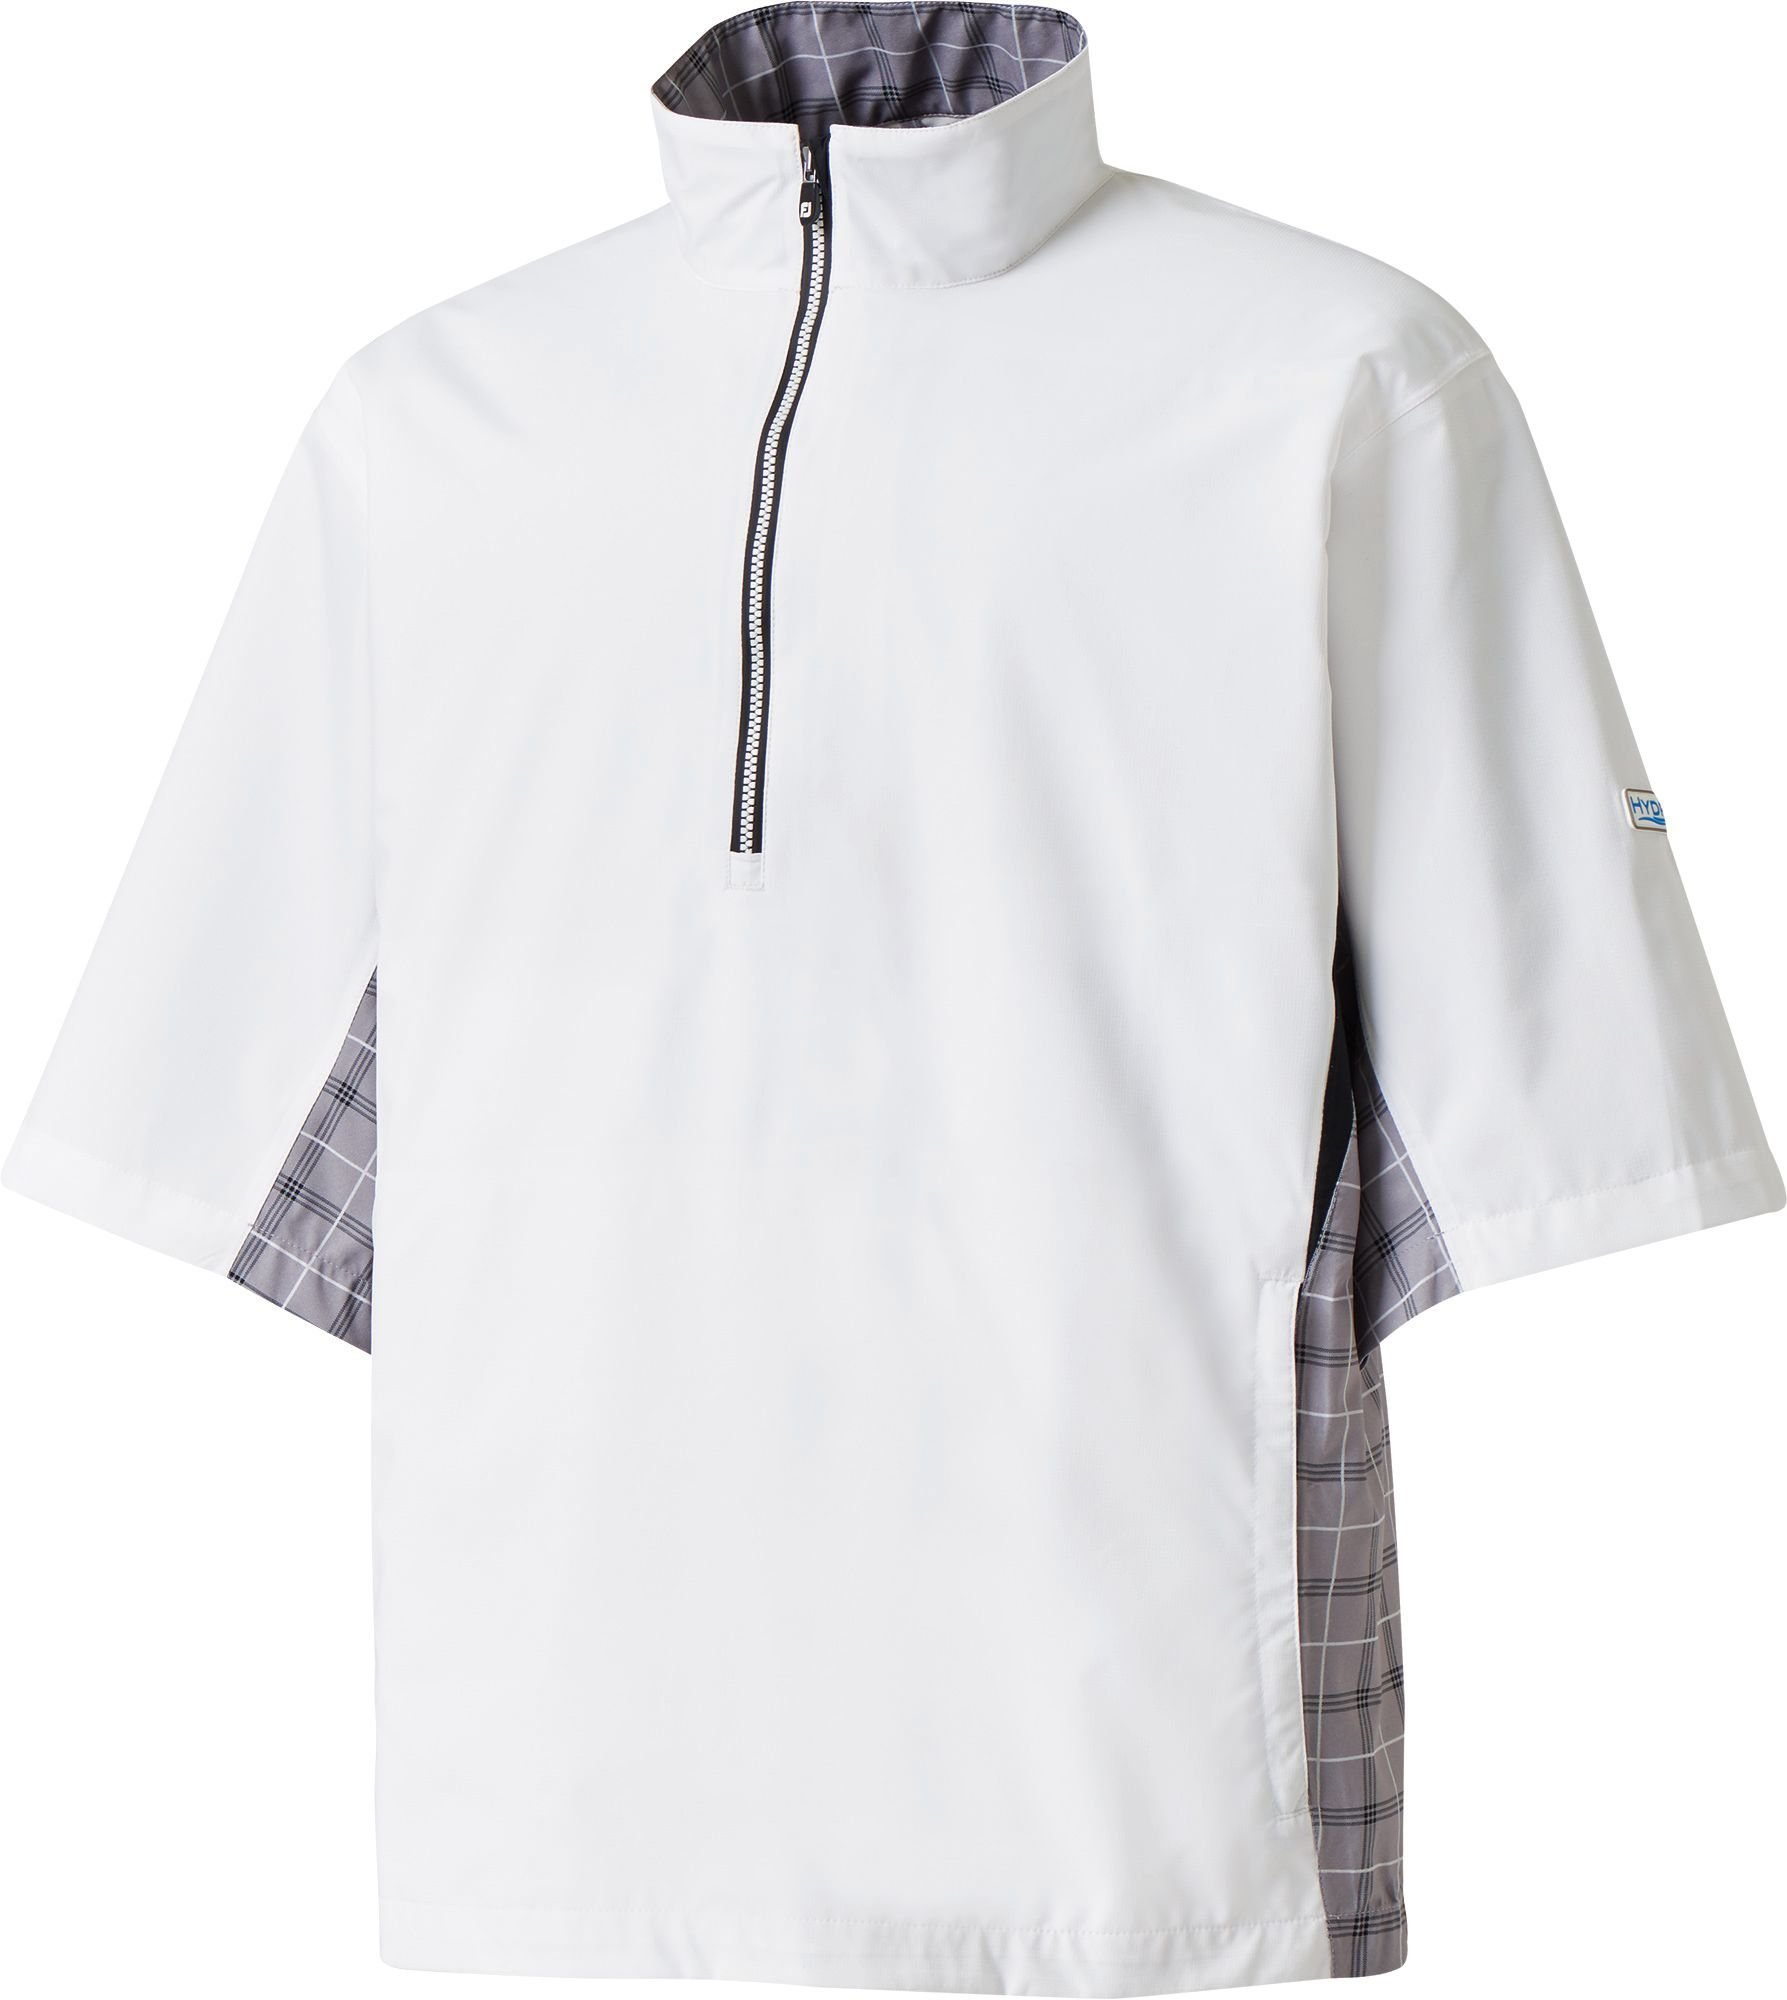 FootJoy Men's Hydrolite Short Sleeve Golf Rain Shirt (Medium, White/Grey Check/Black)